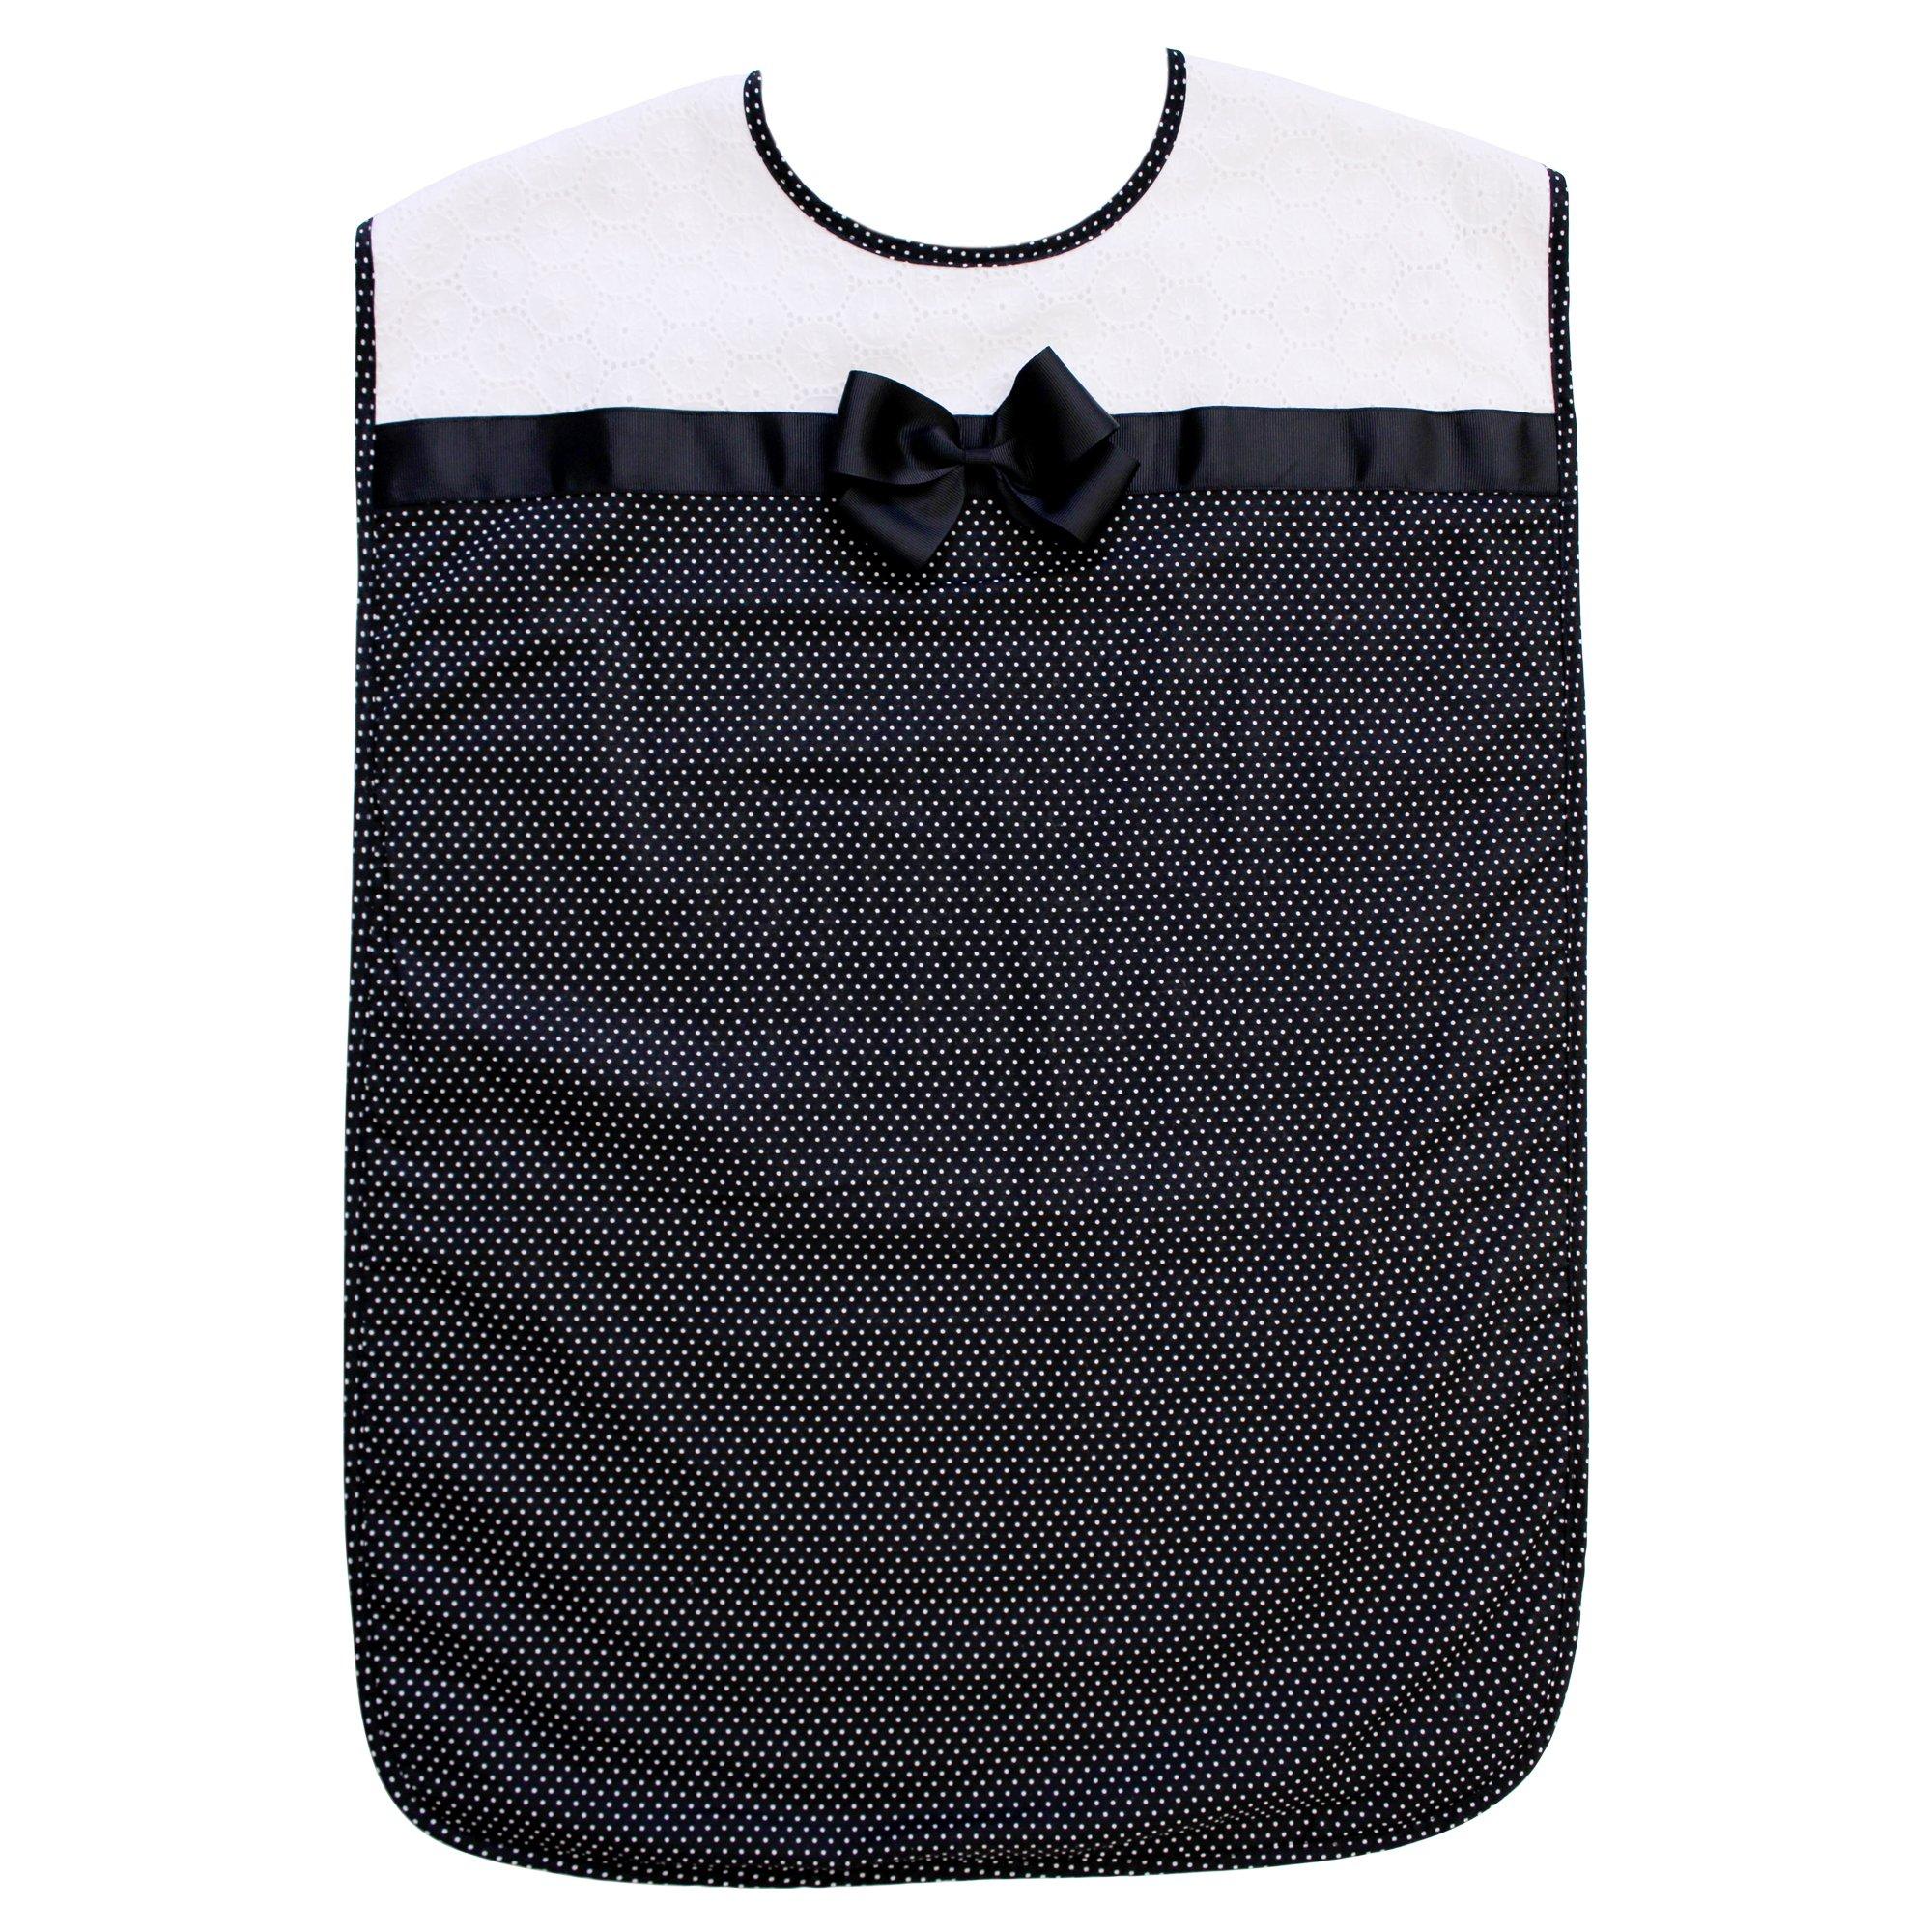 Ladies Adult Bib, Black Polka-Dot Pattern with Bowtie, Frenchie Mini Couture